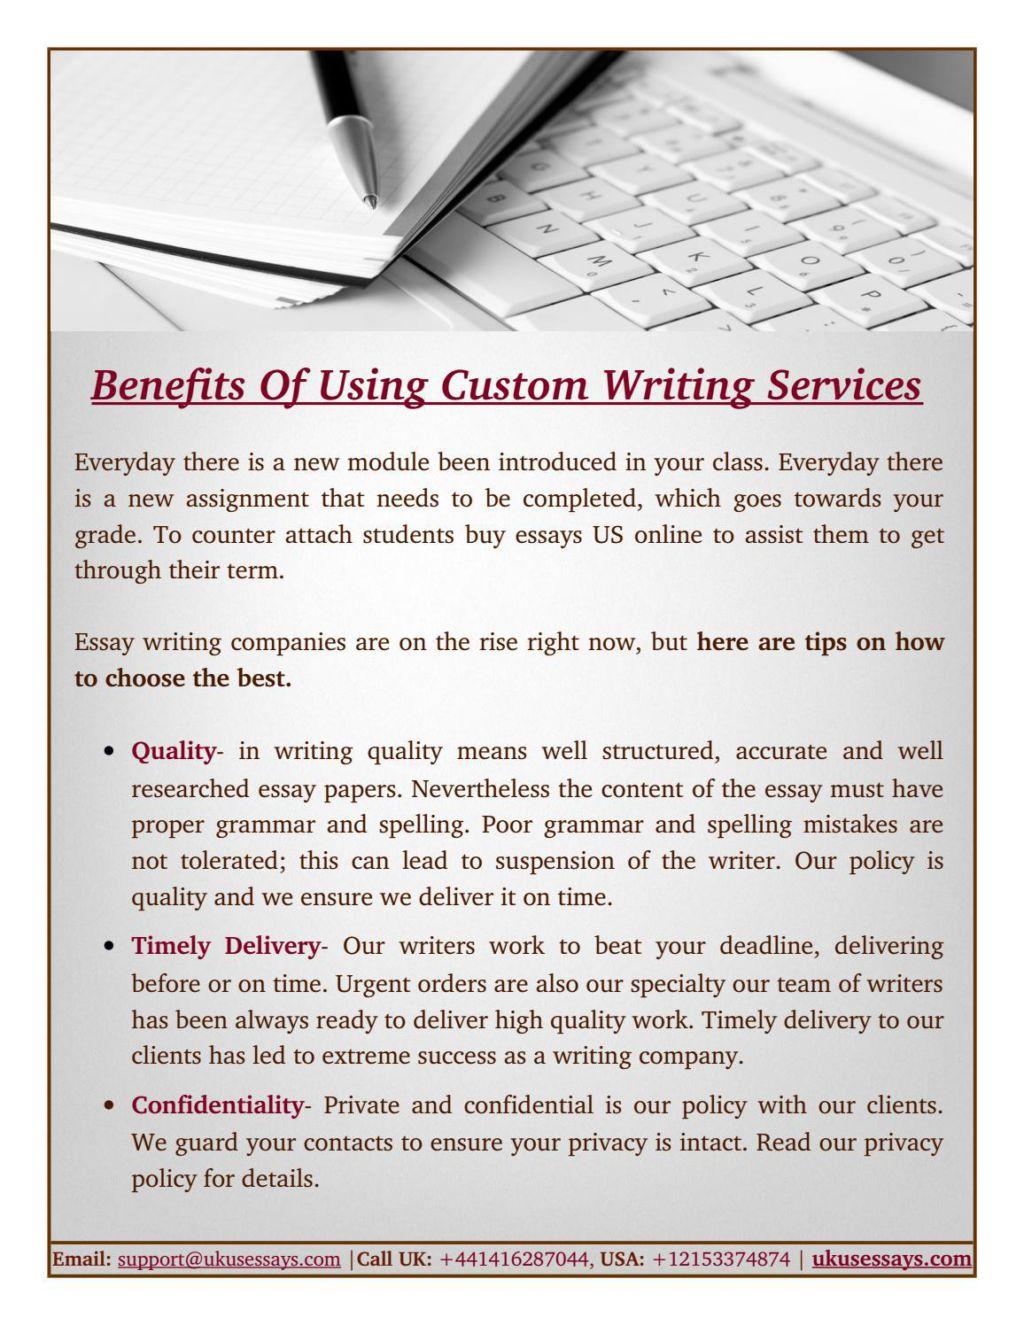 Benefits of essay writing skills